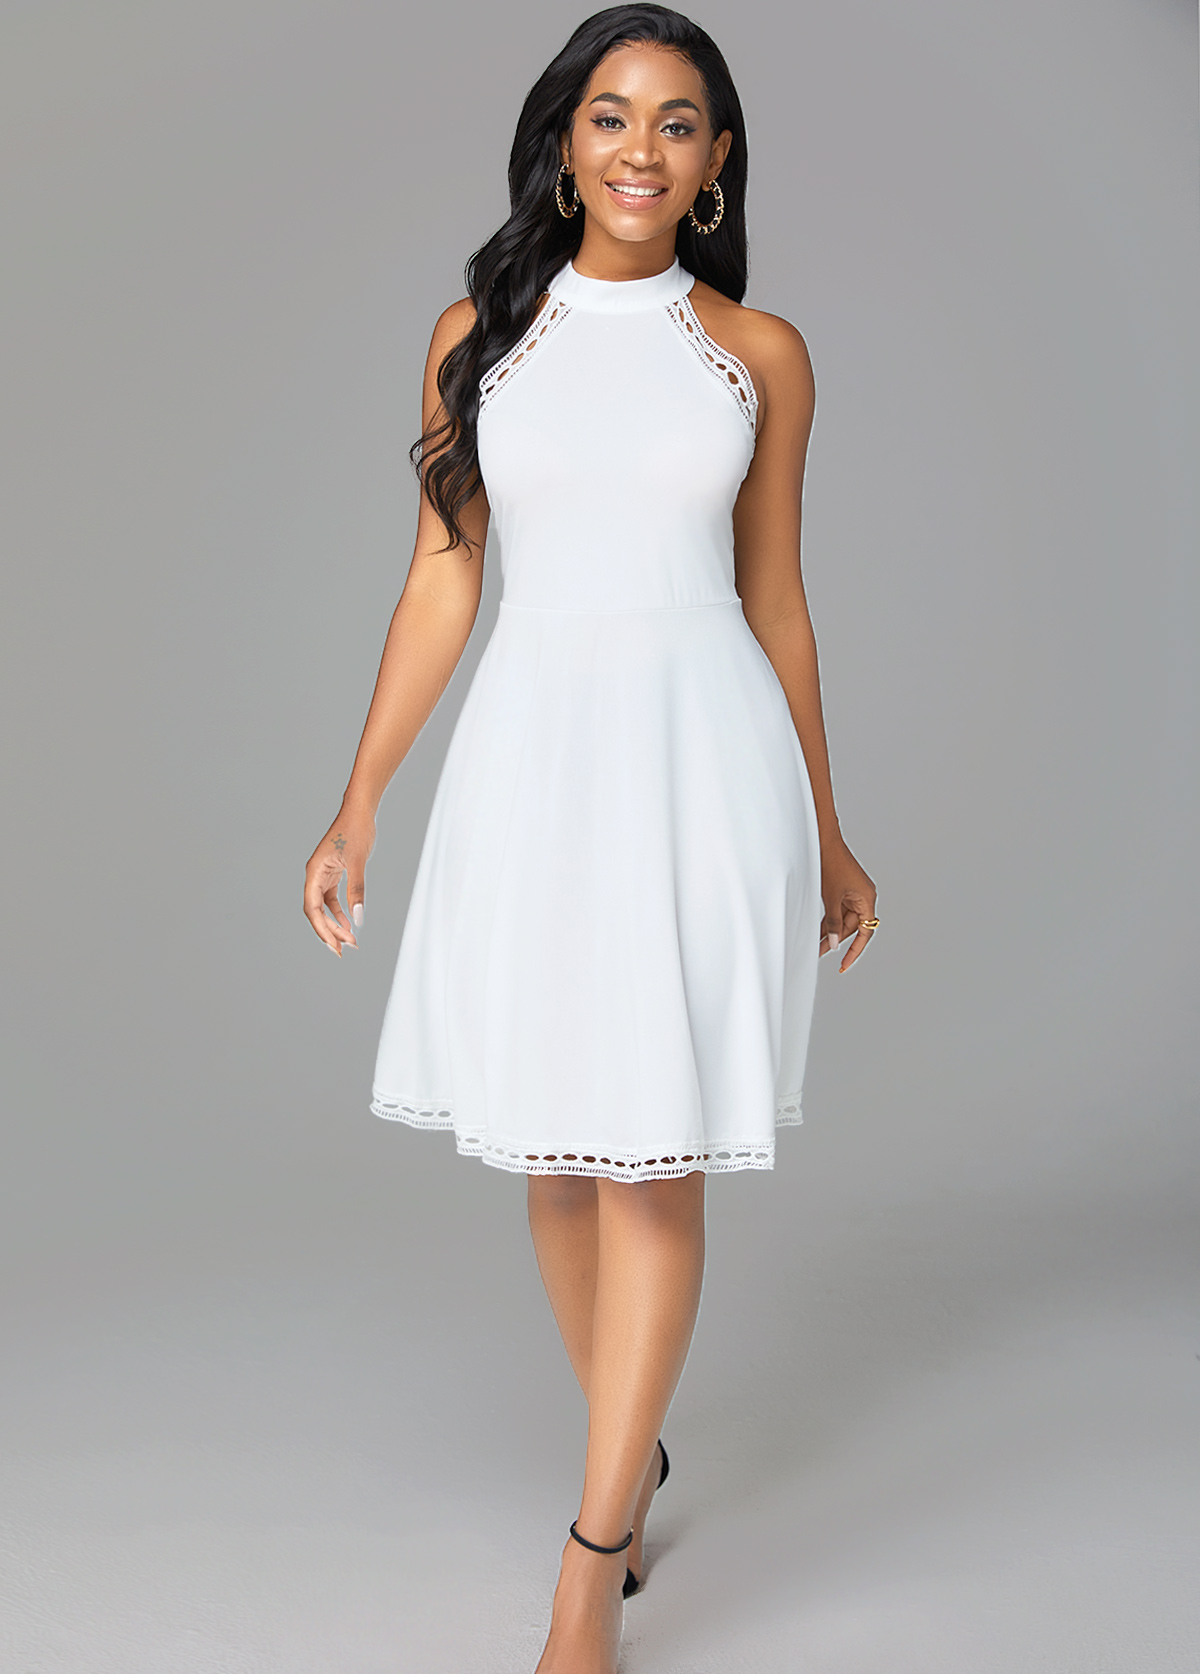 Pierced Mock Neck Sleeveless Solid Dress